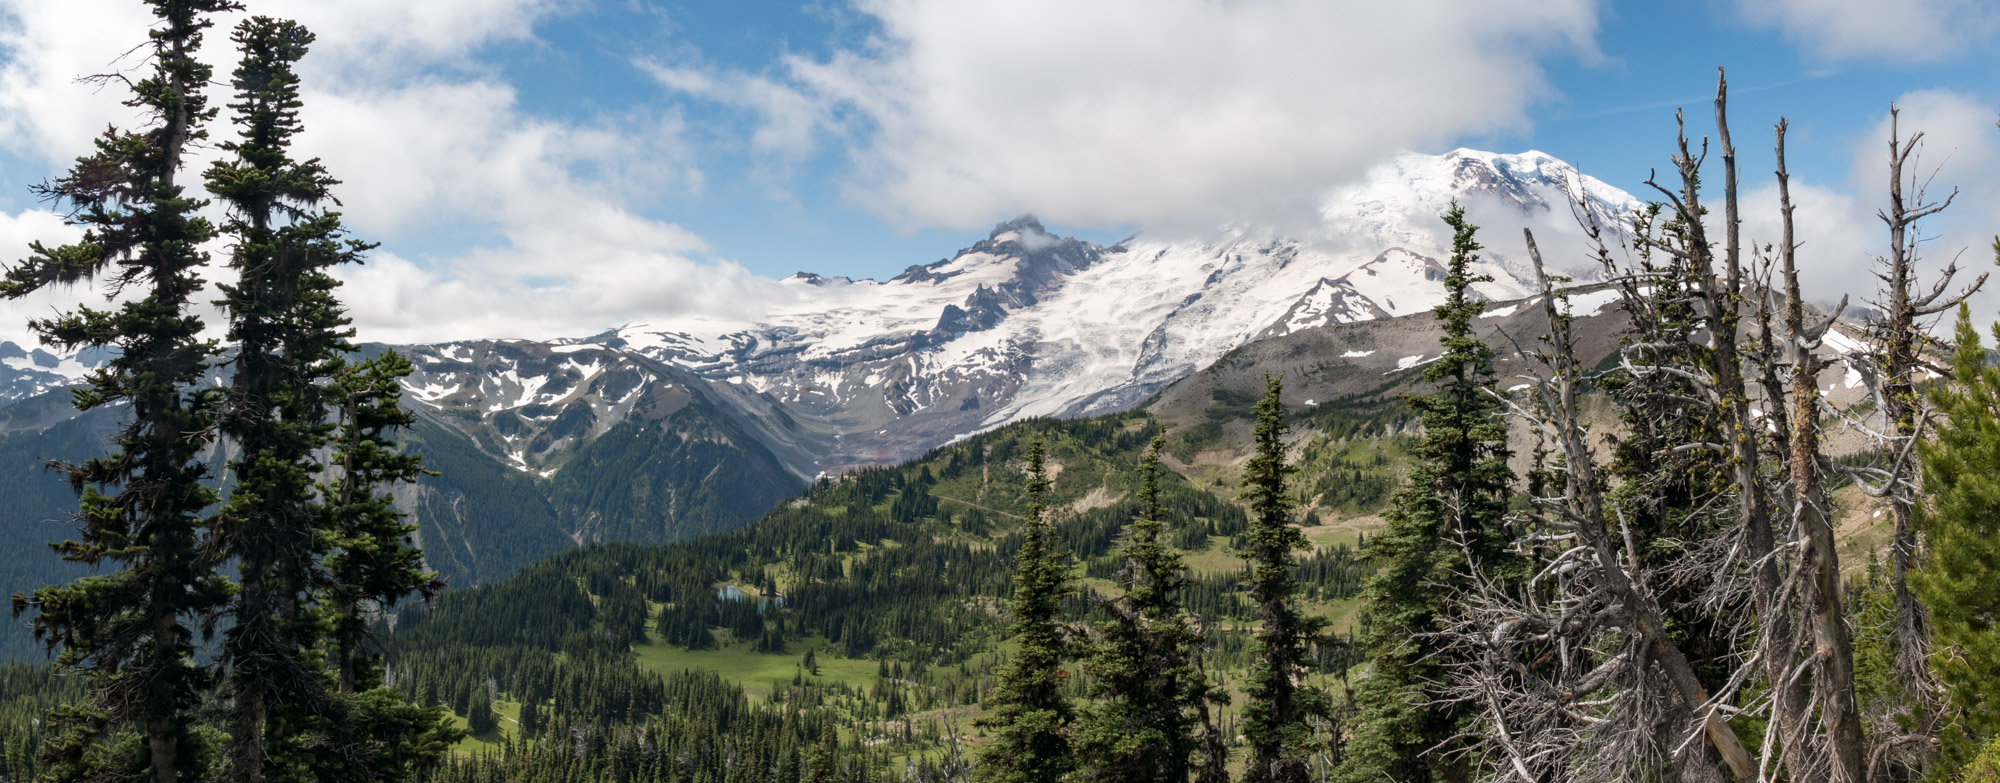 Ranier panorama